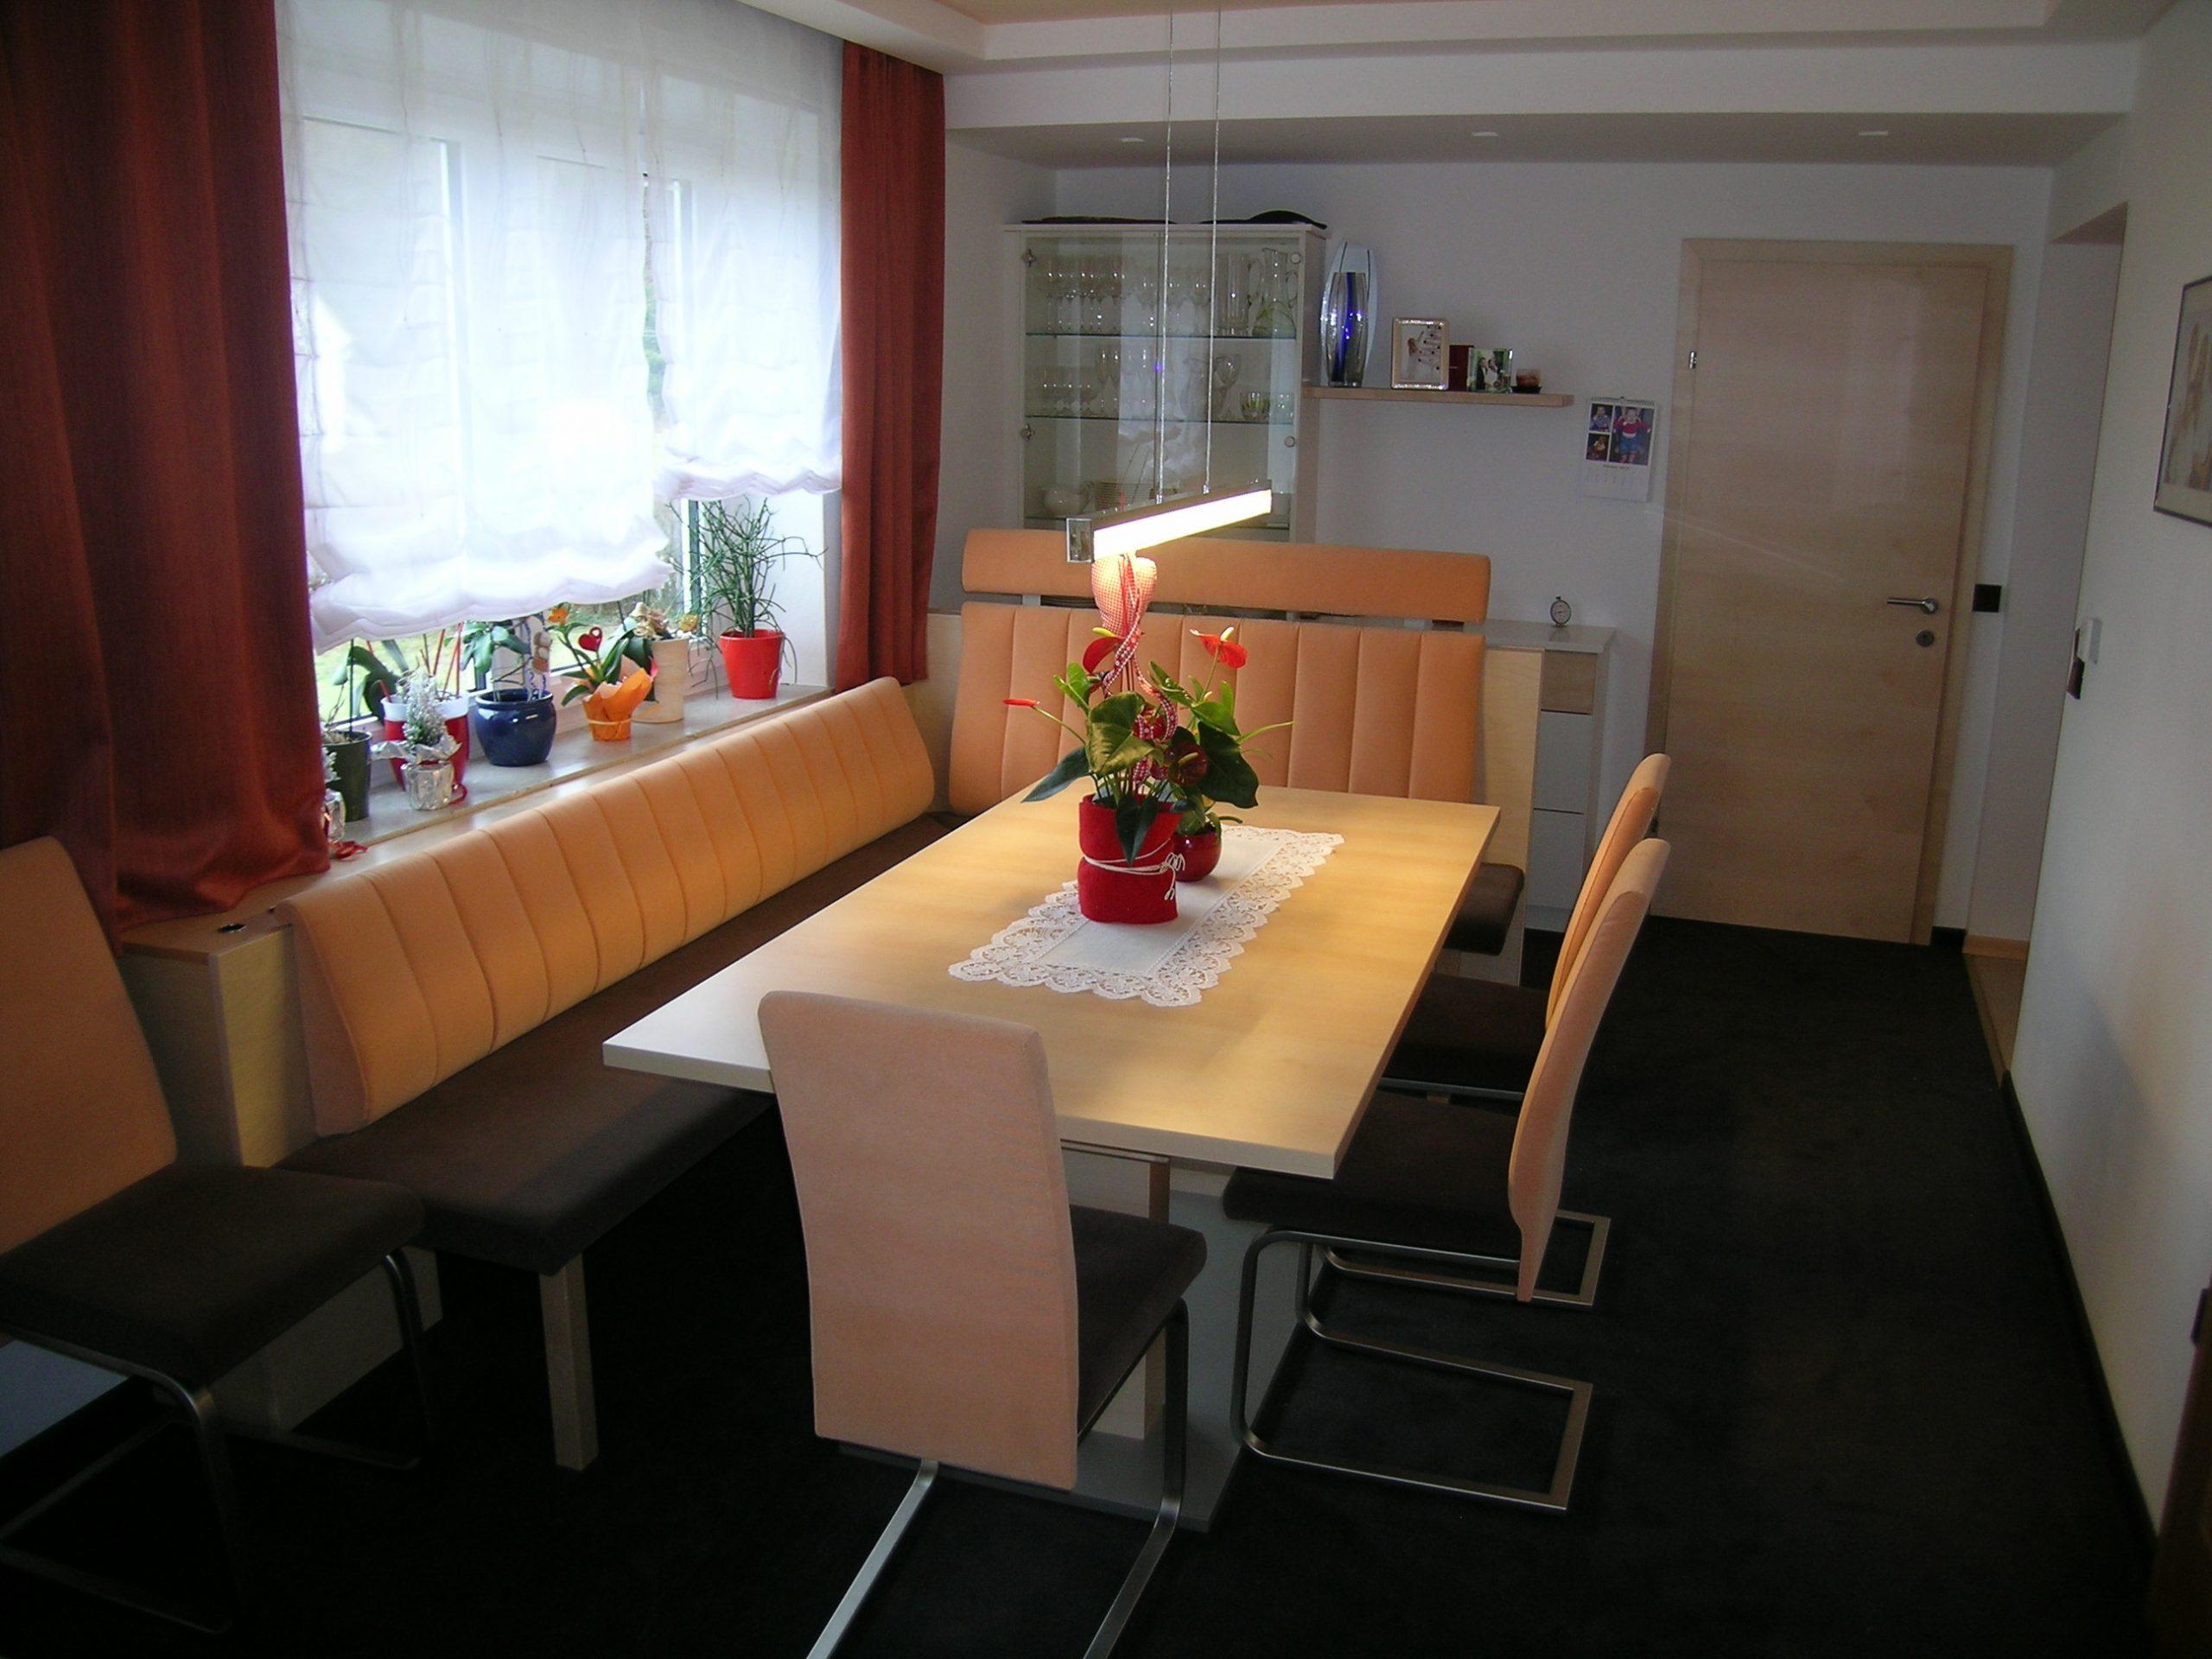 Full Size of Sideboard Küche Weiß Sideboard Küche Home24 Anrichte Küche Vintage Anrichte Küche Ikea Küche Anrichte Küche